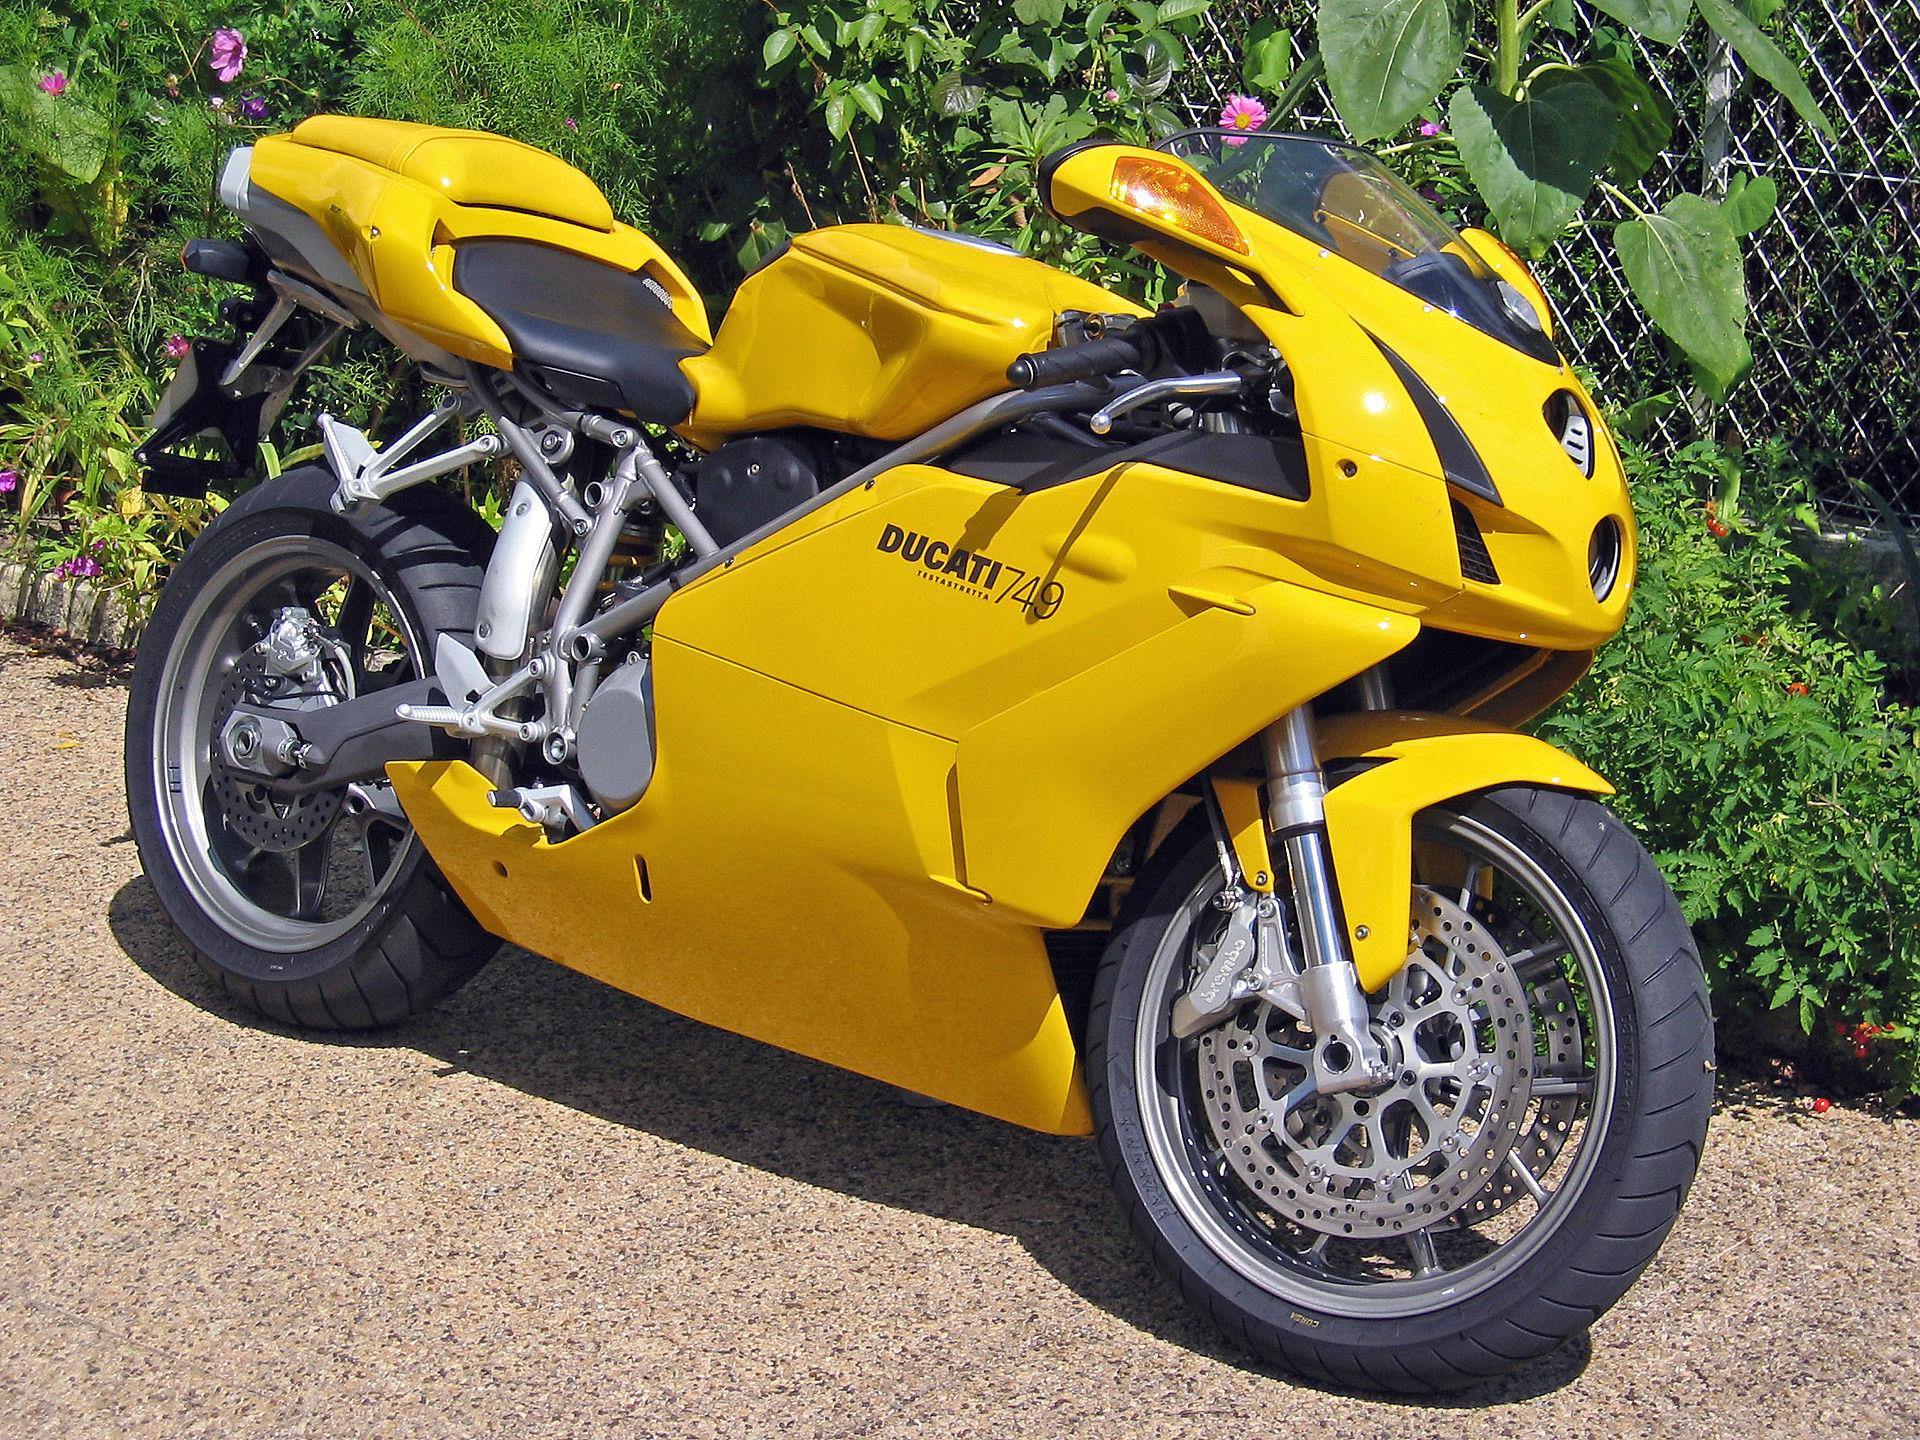 Motorsykkel wikipedia - Image moto sportive ...